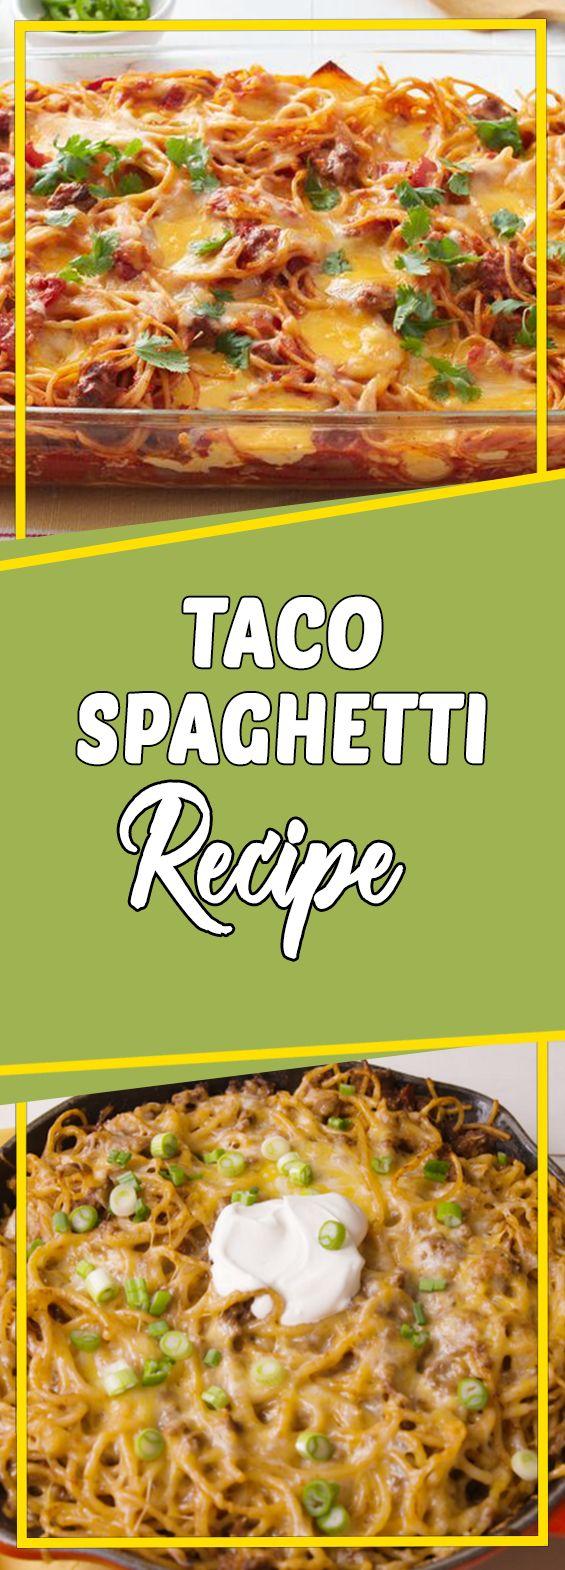 Taco Spaghetti Recipe #breakfast #recipeoftheday #recipeideas #dinner #breakfastrecipes #lunch